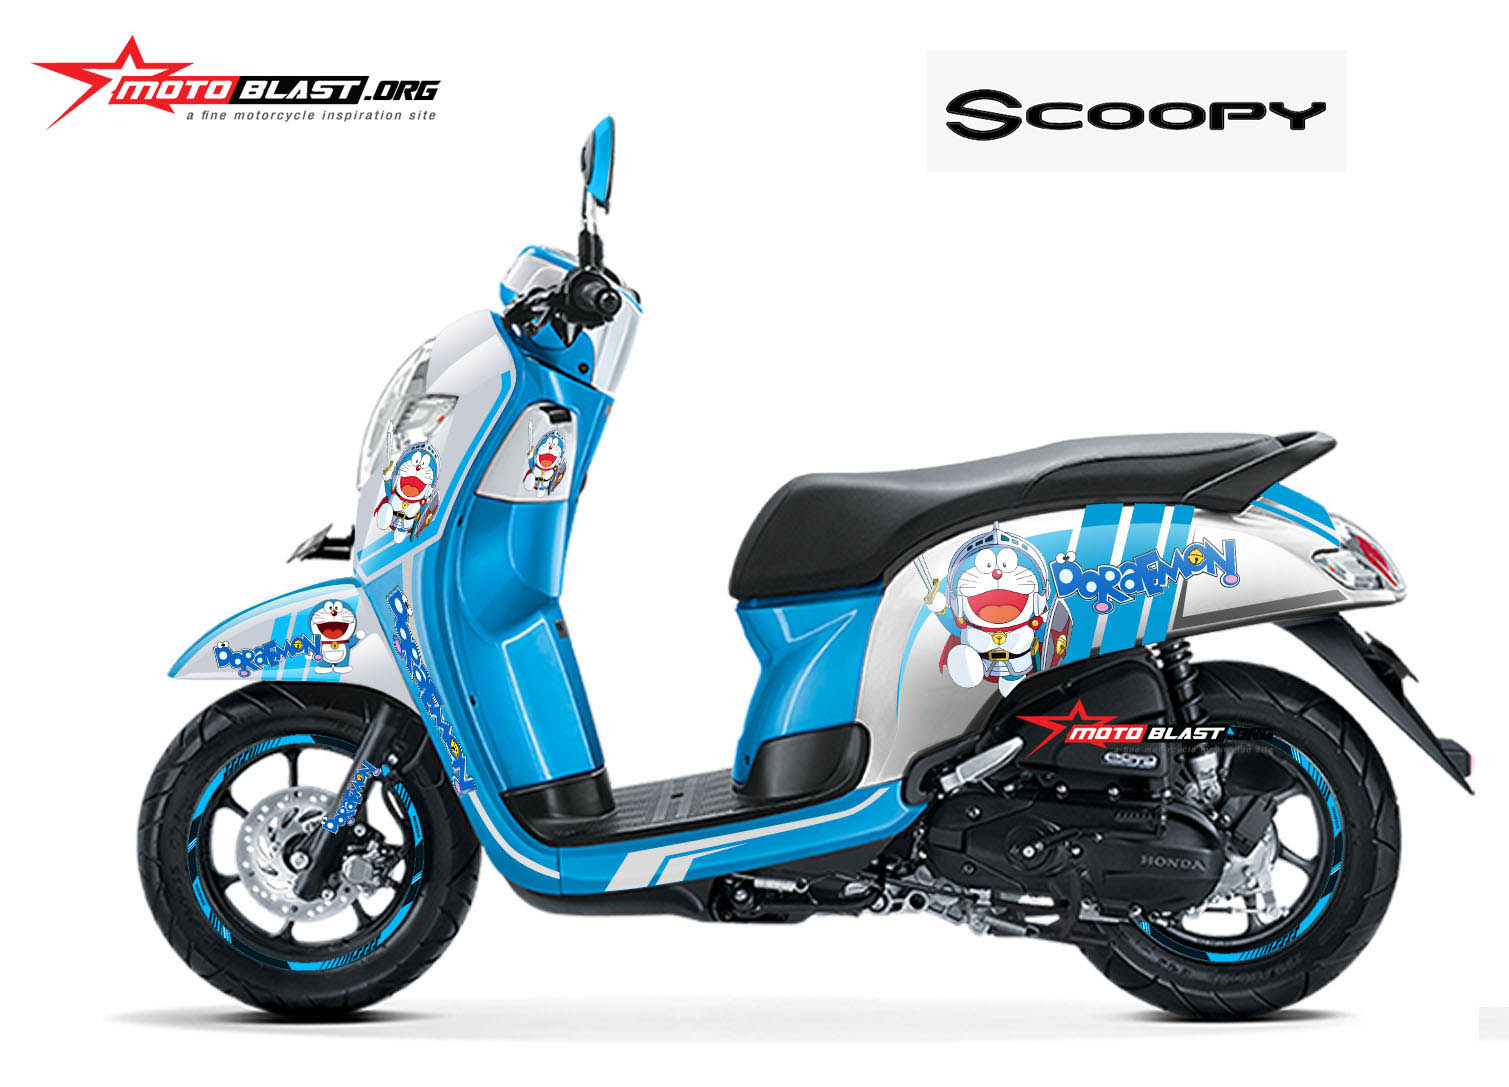 Populer Modifikasi Motor Scoopy 2019 Warna Biru Modifhits